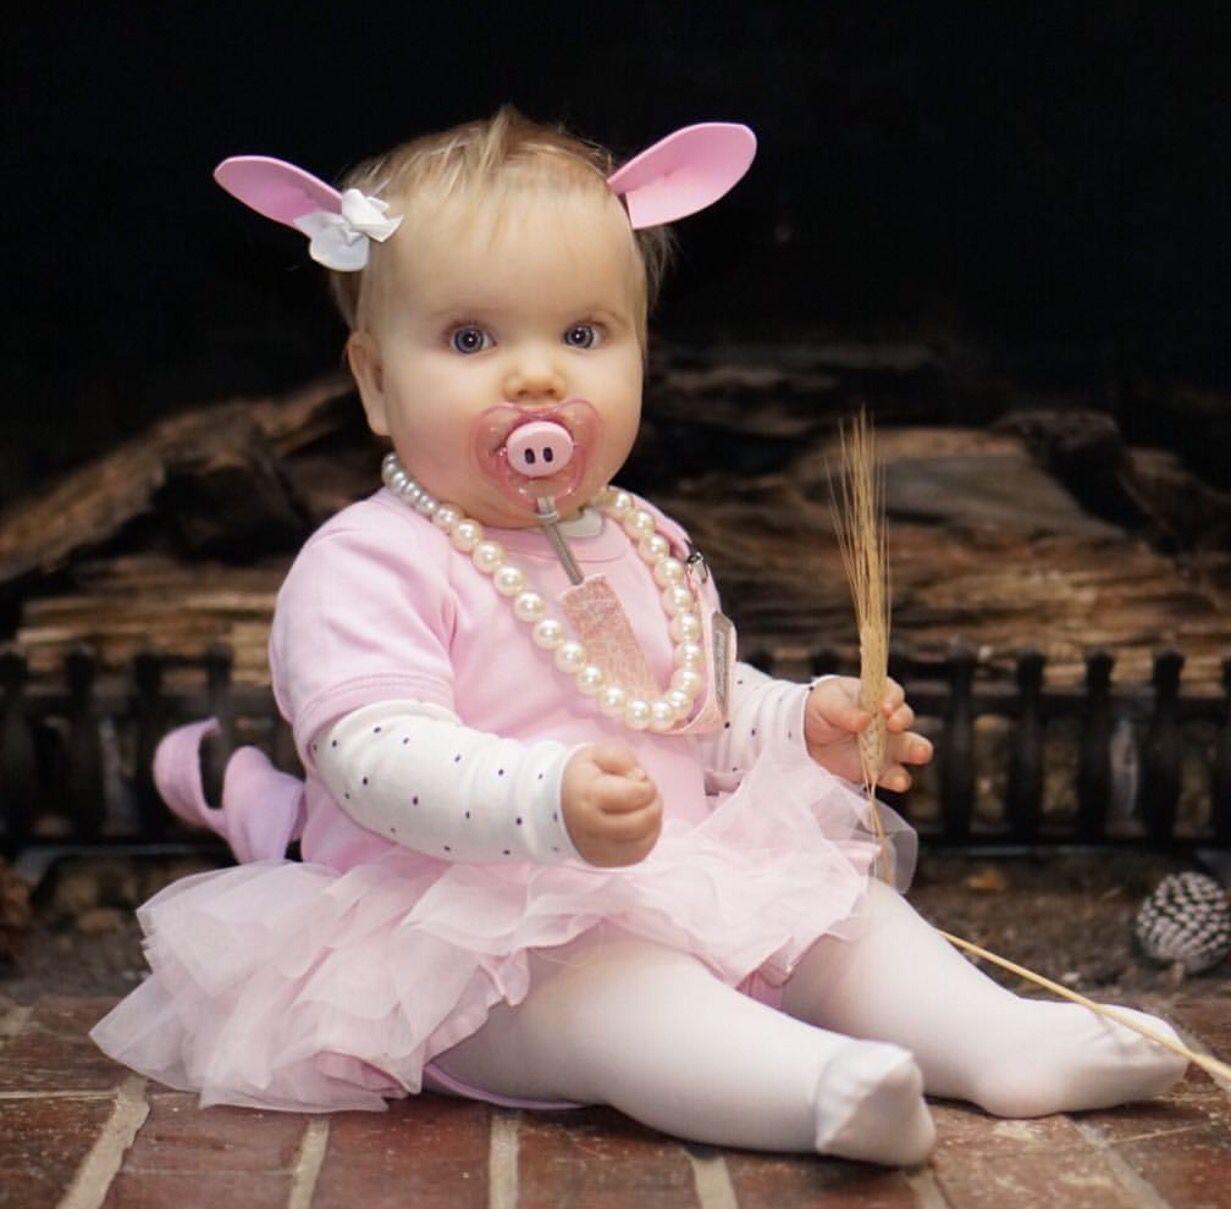 little piglet pig piggy diy halloween costume for baby